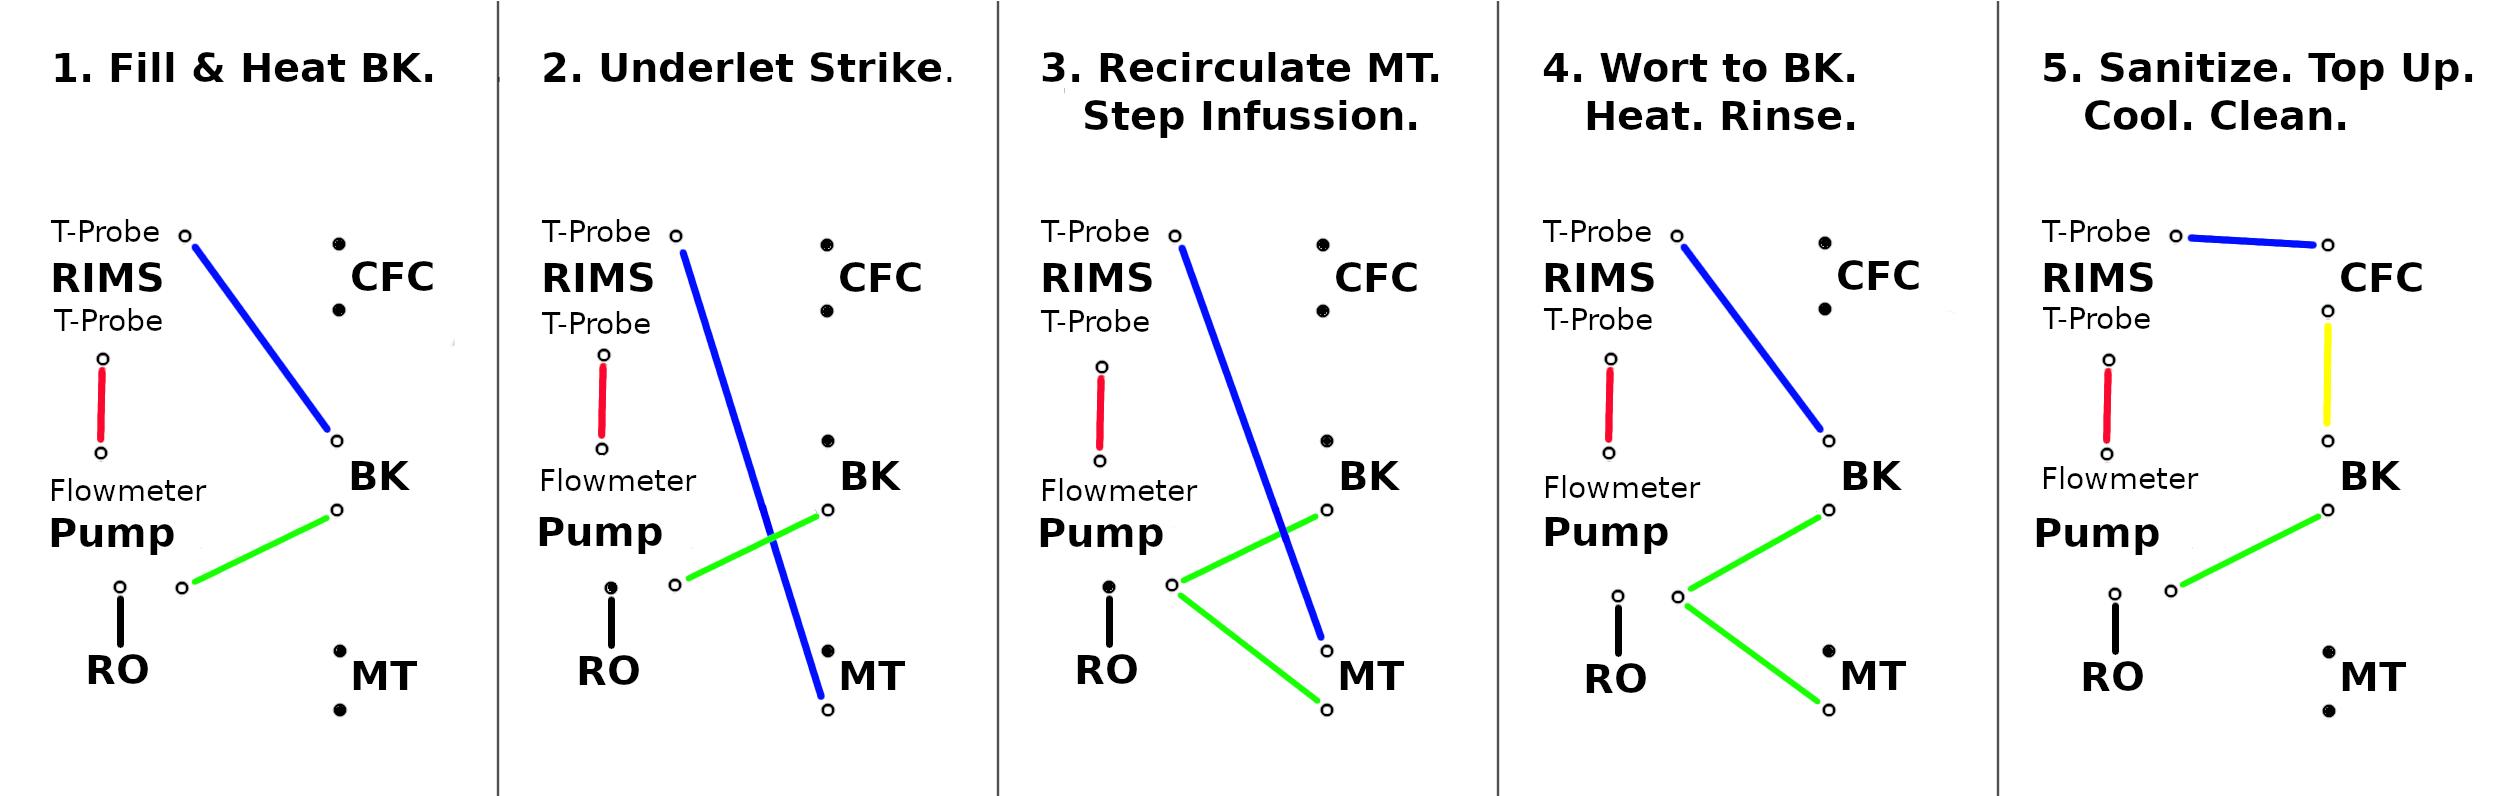 BarryBrew Process Flow Diagram20.jpg